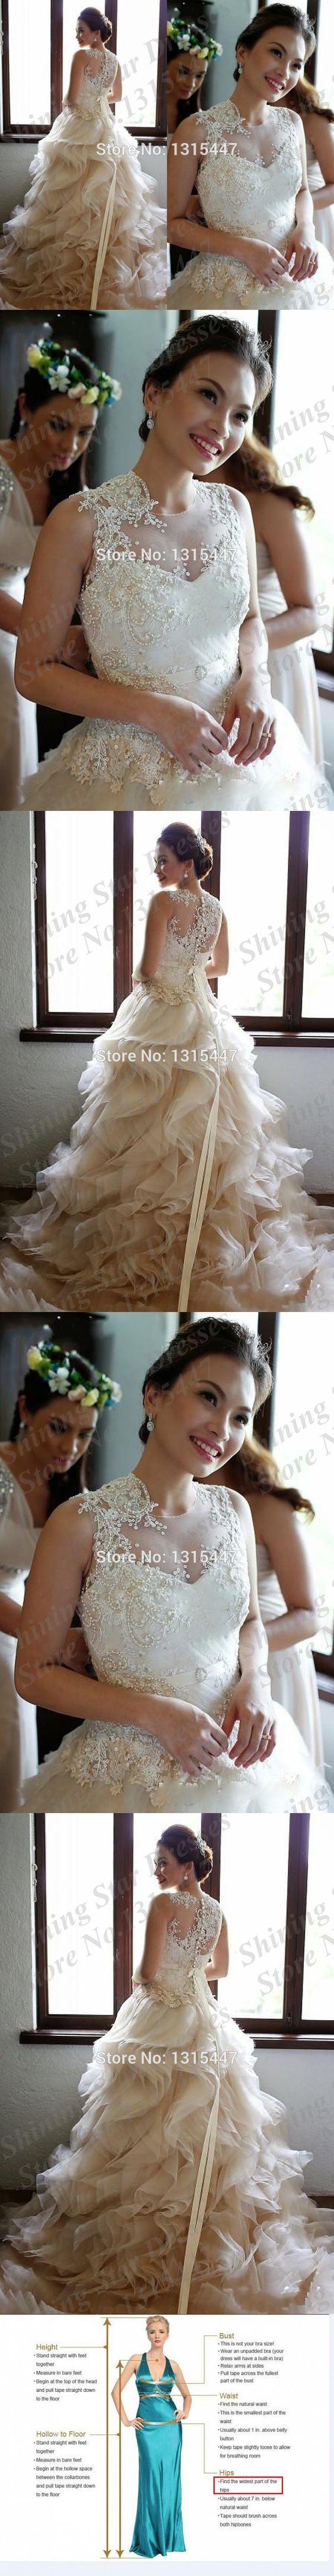 Vestido de noiva princesa vintage wedding dresses 2015 new casamento o-neck ruffled bridal dresses formal gowns robe de mariage $279.99